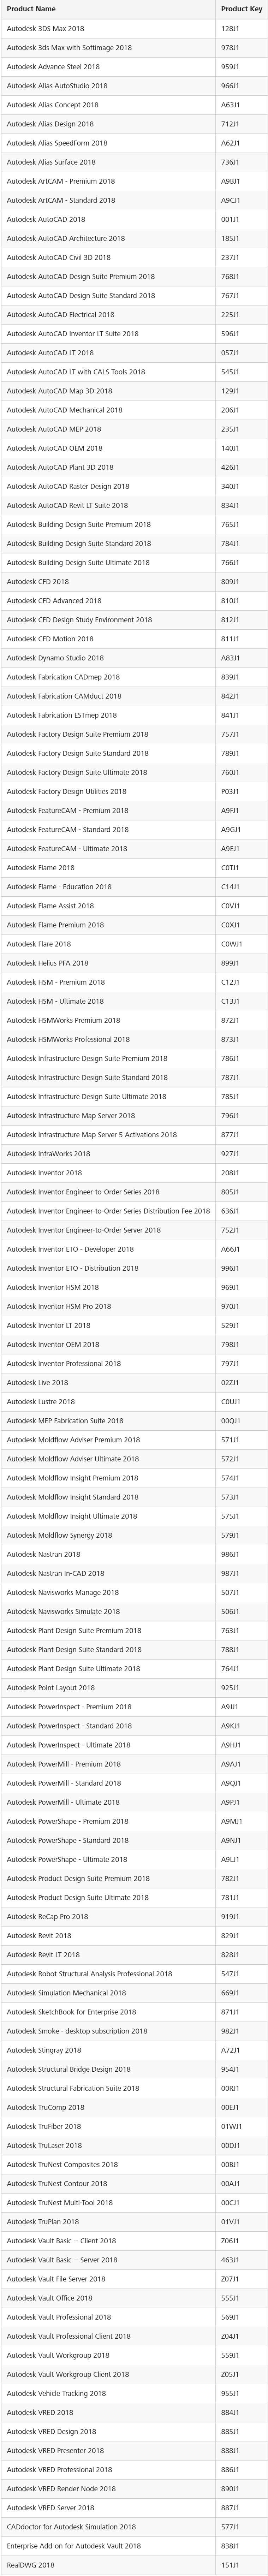 2017 05 03 03 58 46 min - كراك منتجات أتوديسك 2018 ومفاتيحها